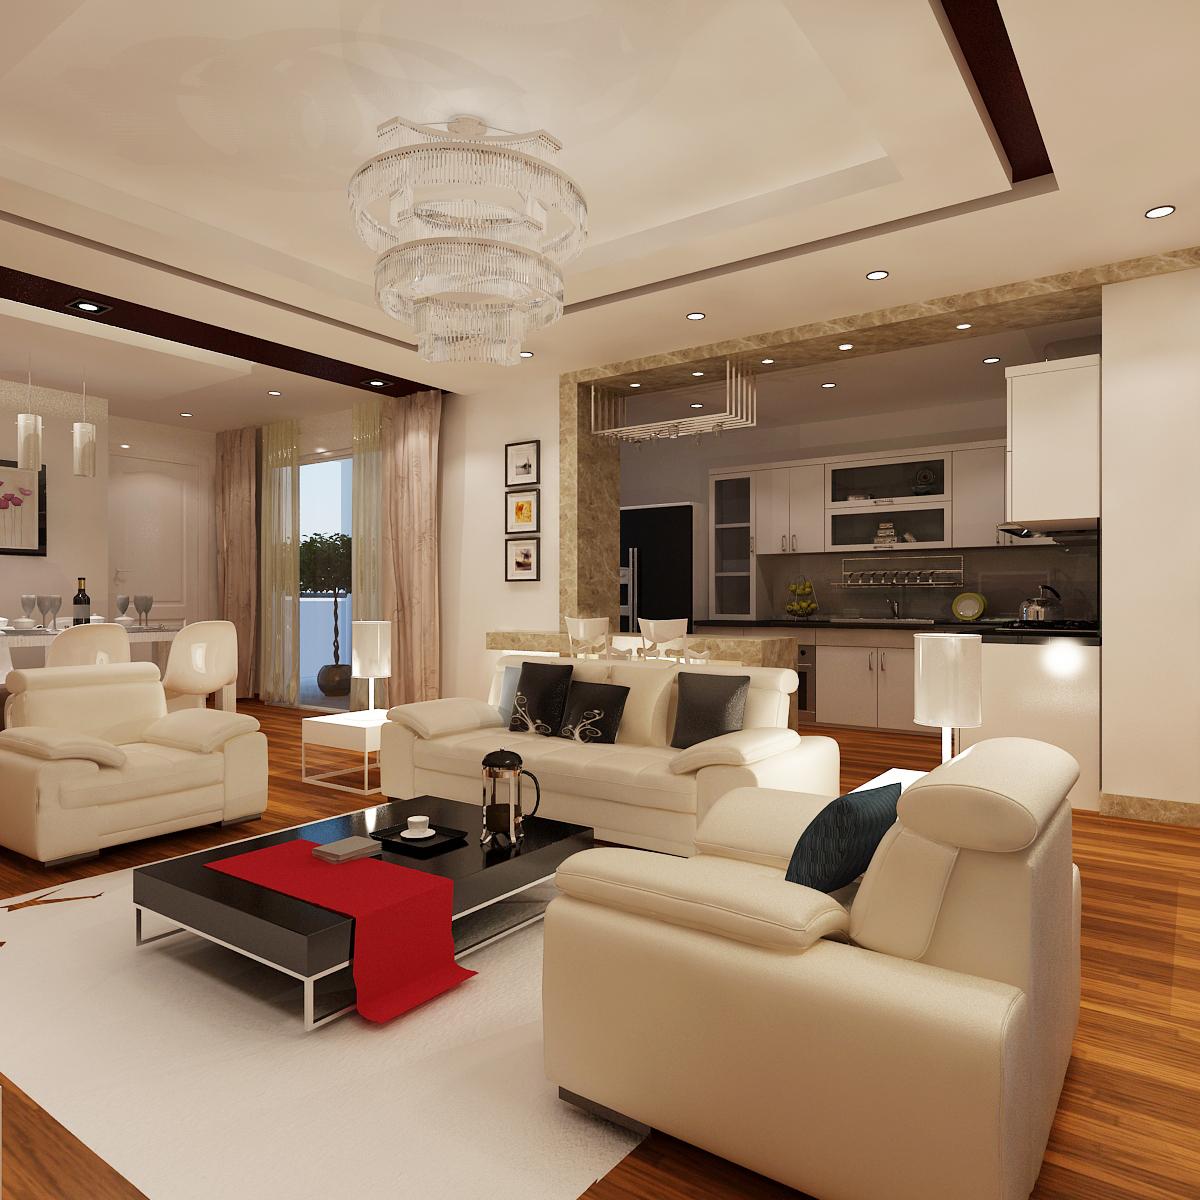 Barano Model Home Interior Design: Luxury Detailed House Cutaway 3D Model 3D Model